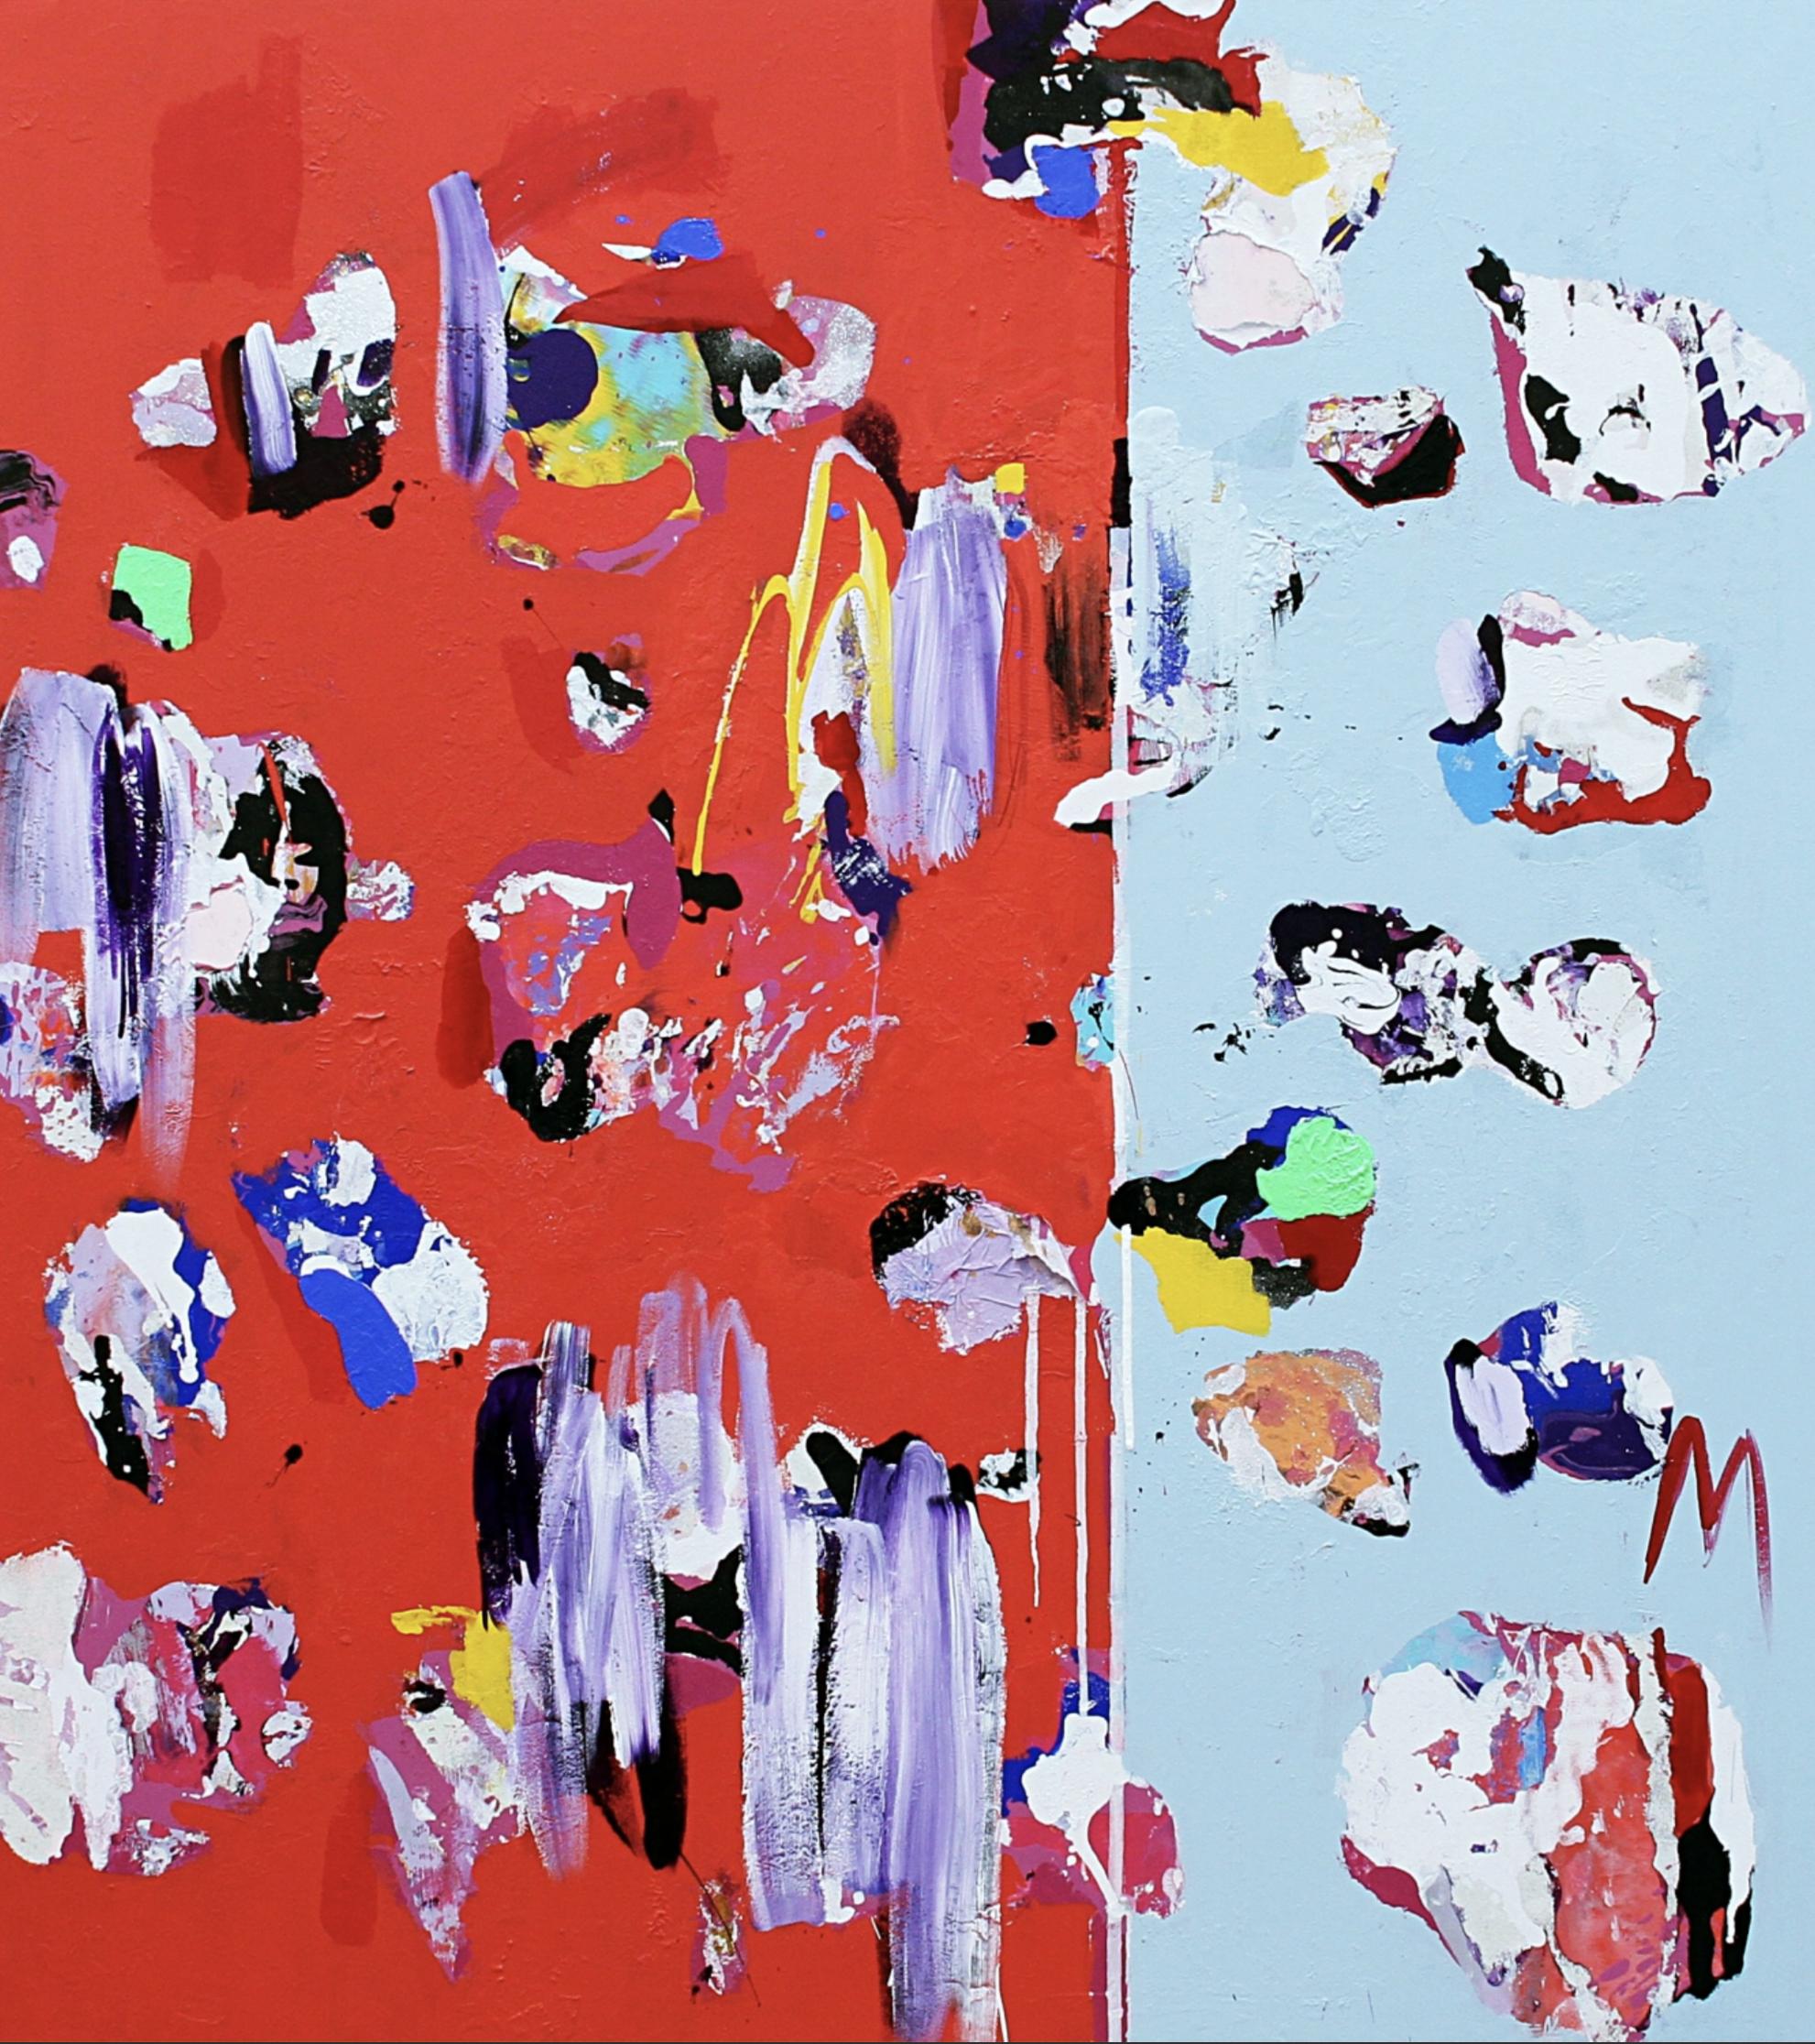 "Título:  ""ATLAS Parallel"", 2018 .  Autor:  Santiago Picatoste.   Técnica:  Óleo sobre lienzo.   Medidas:  180 x 160 cm."